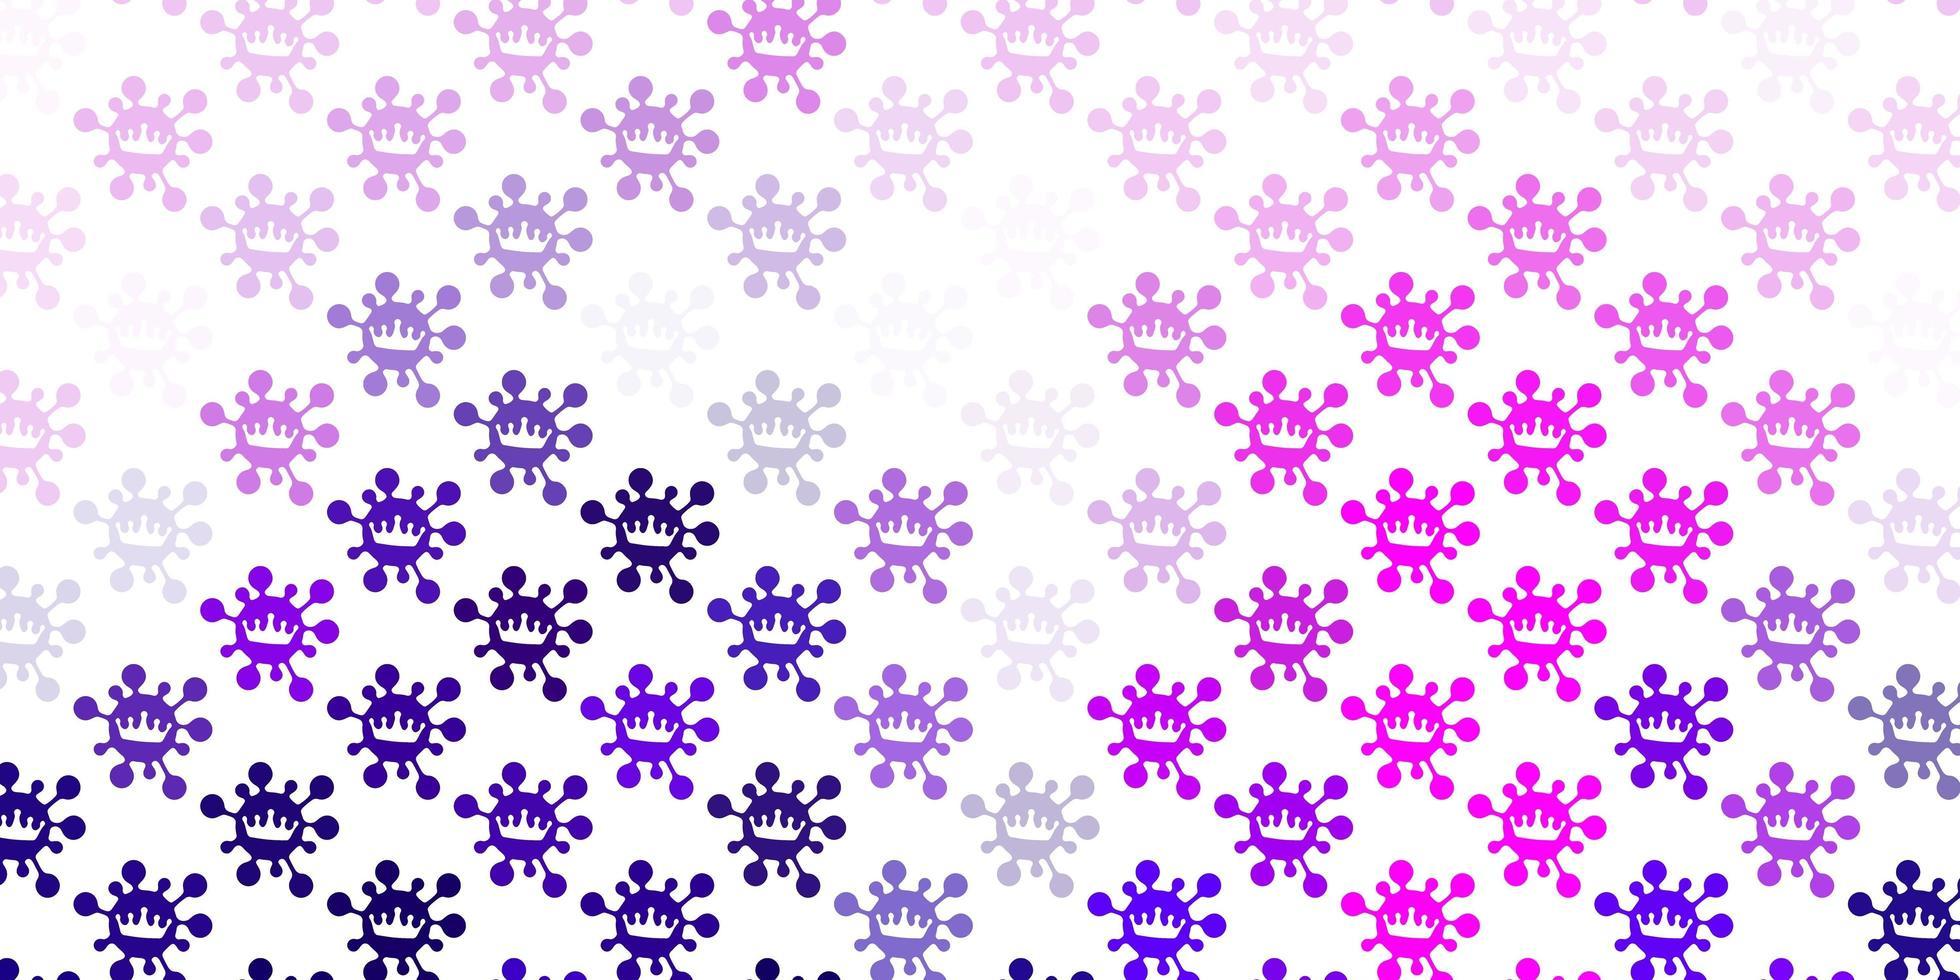 pano de fundo vector roxo claro com símbolos de vírus.